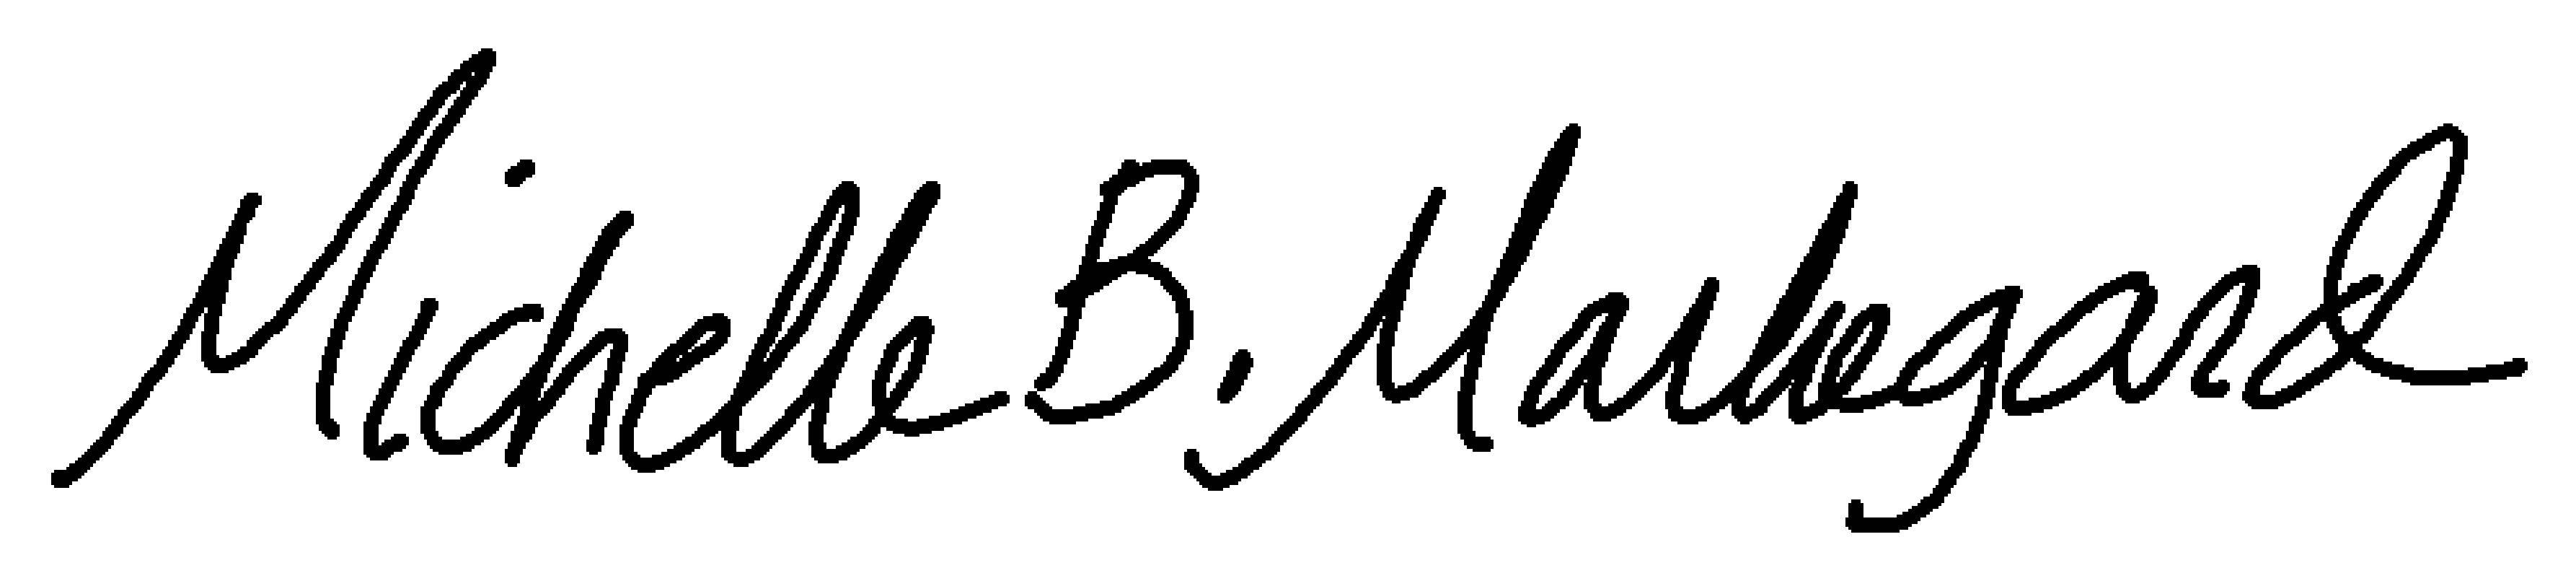 Michelle Markegard's Signature